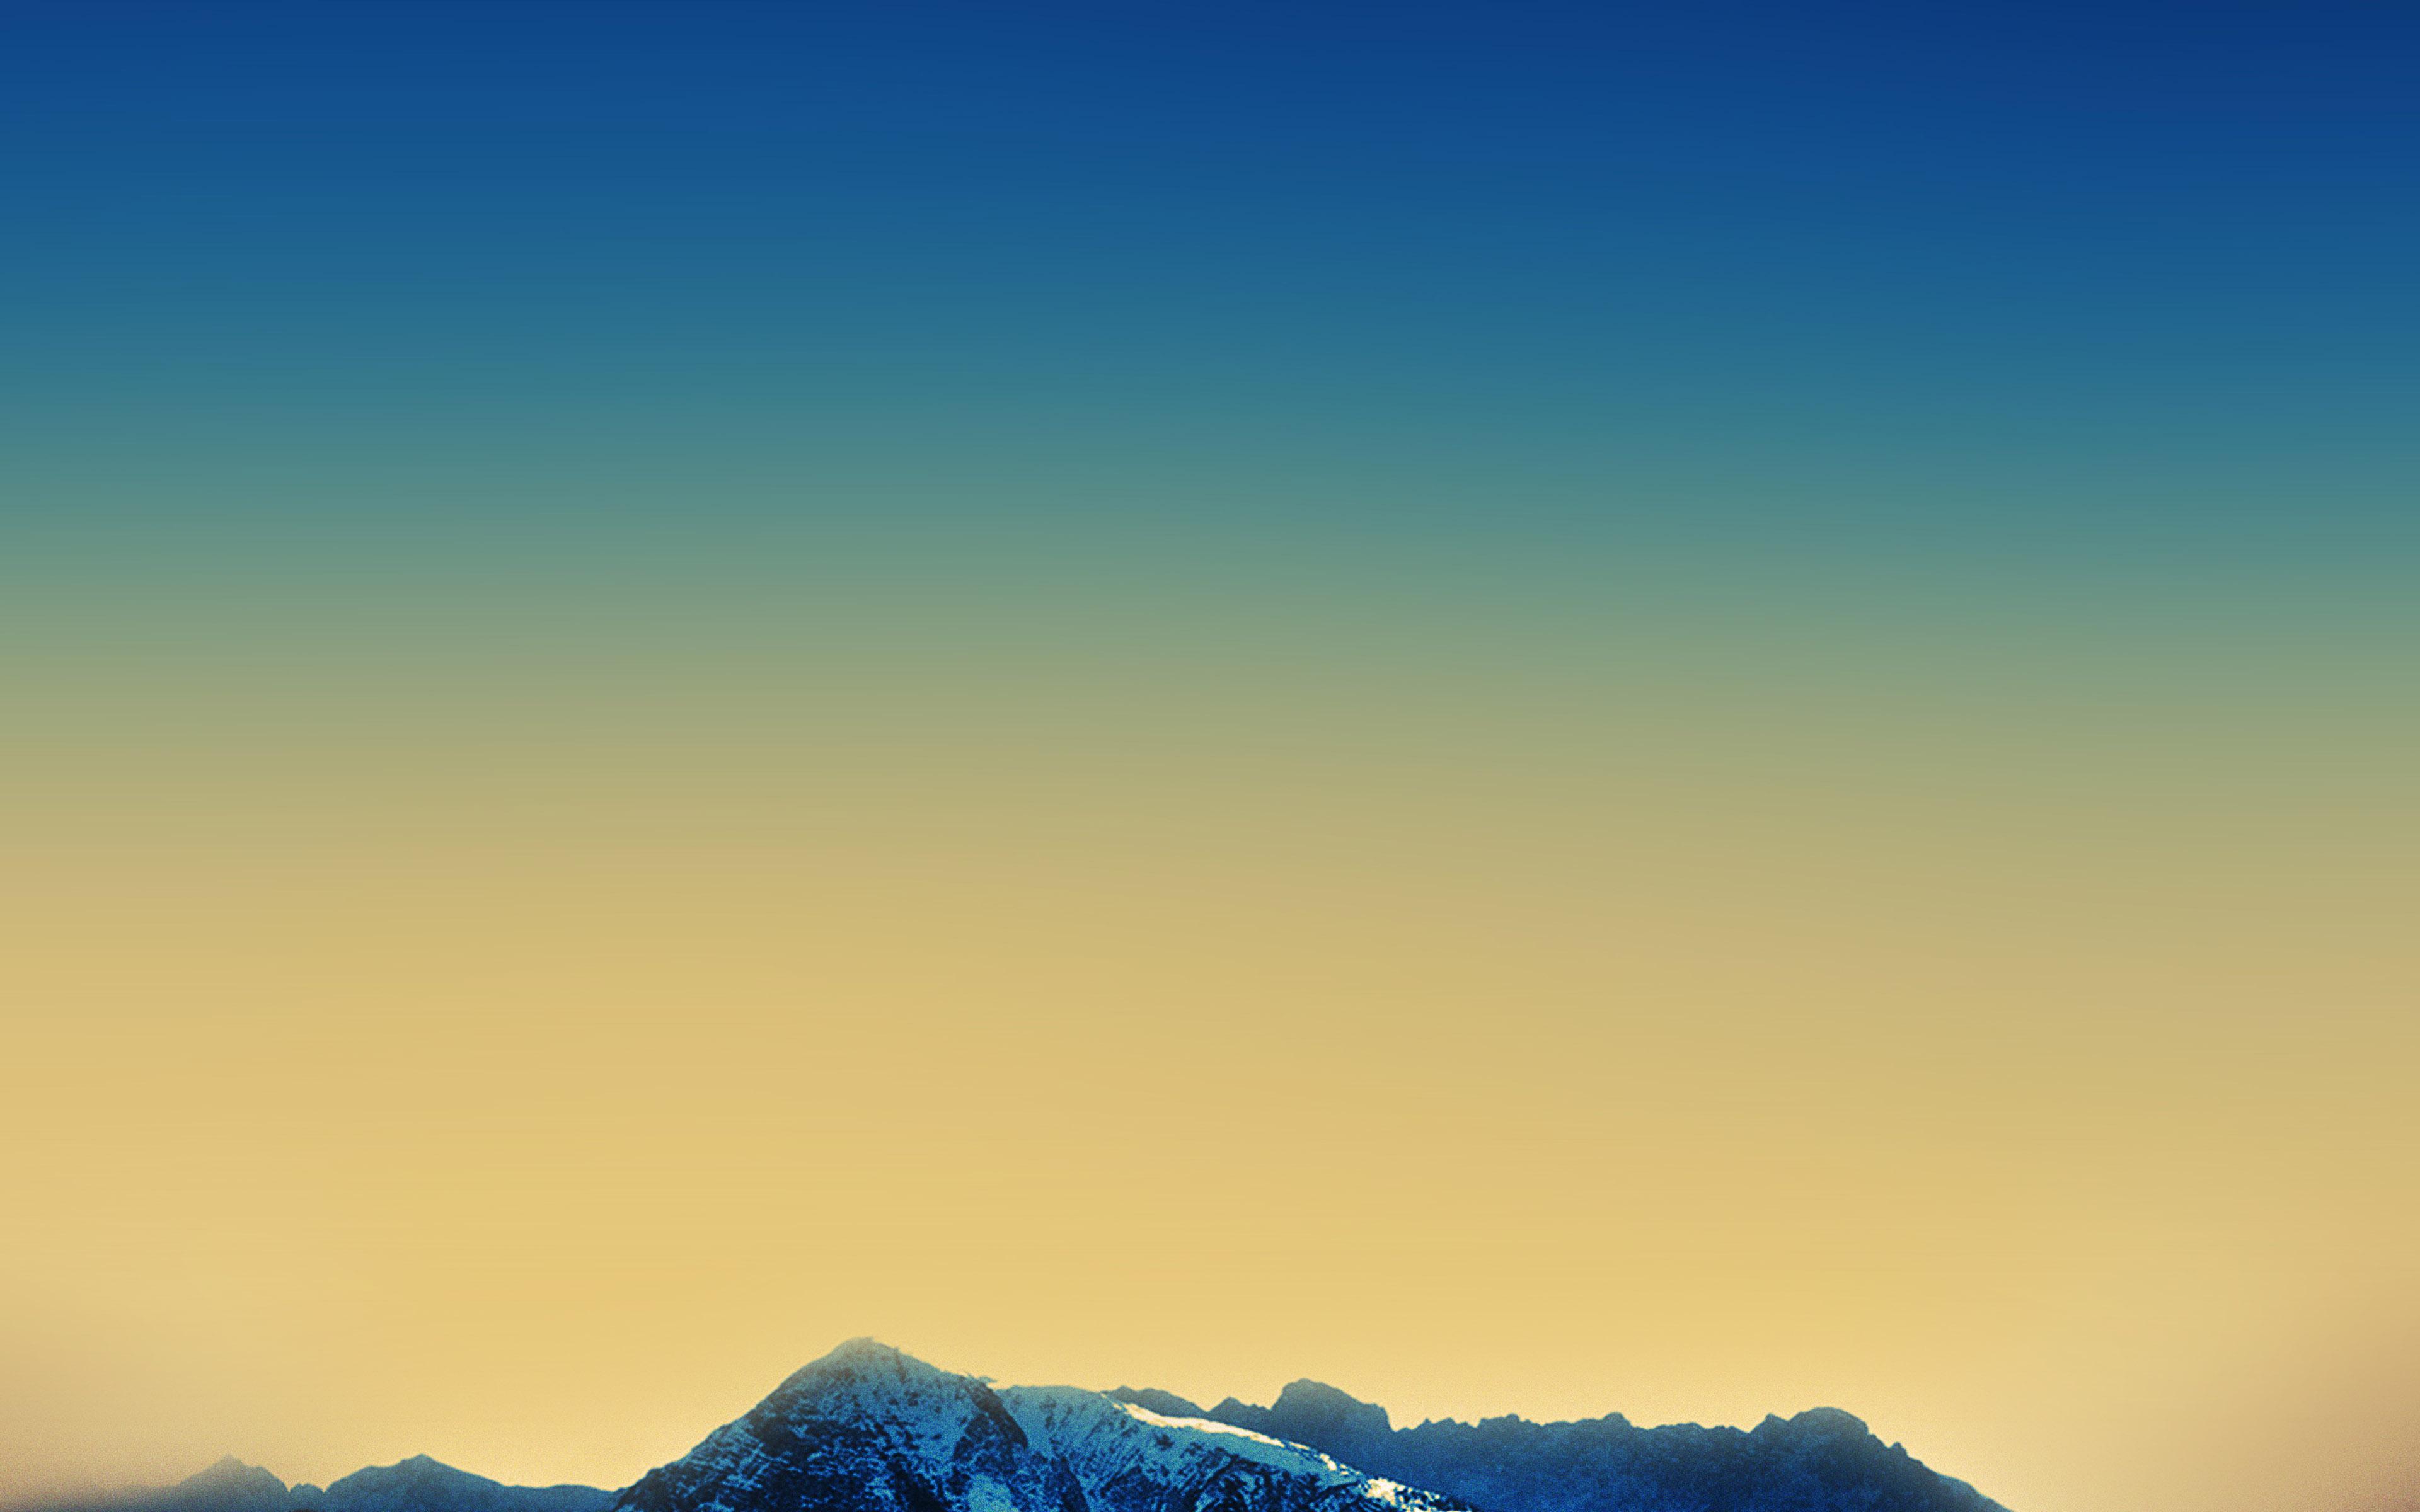 Af27-ipad-air-2-dark-blue-wallpaper-official-mountain